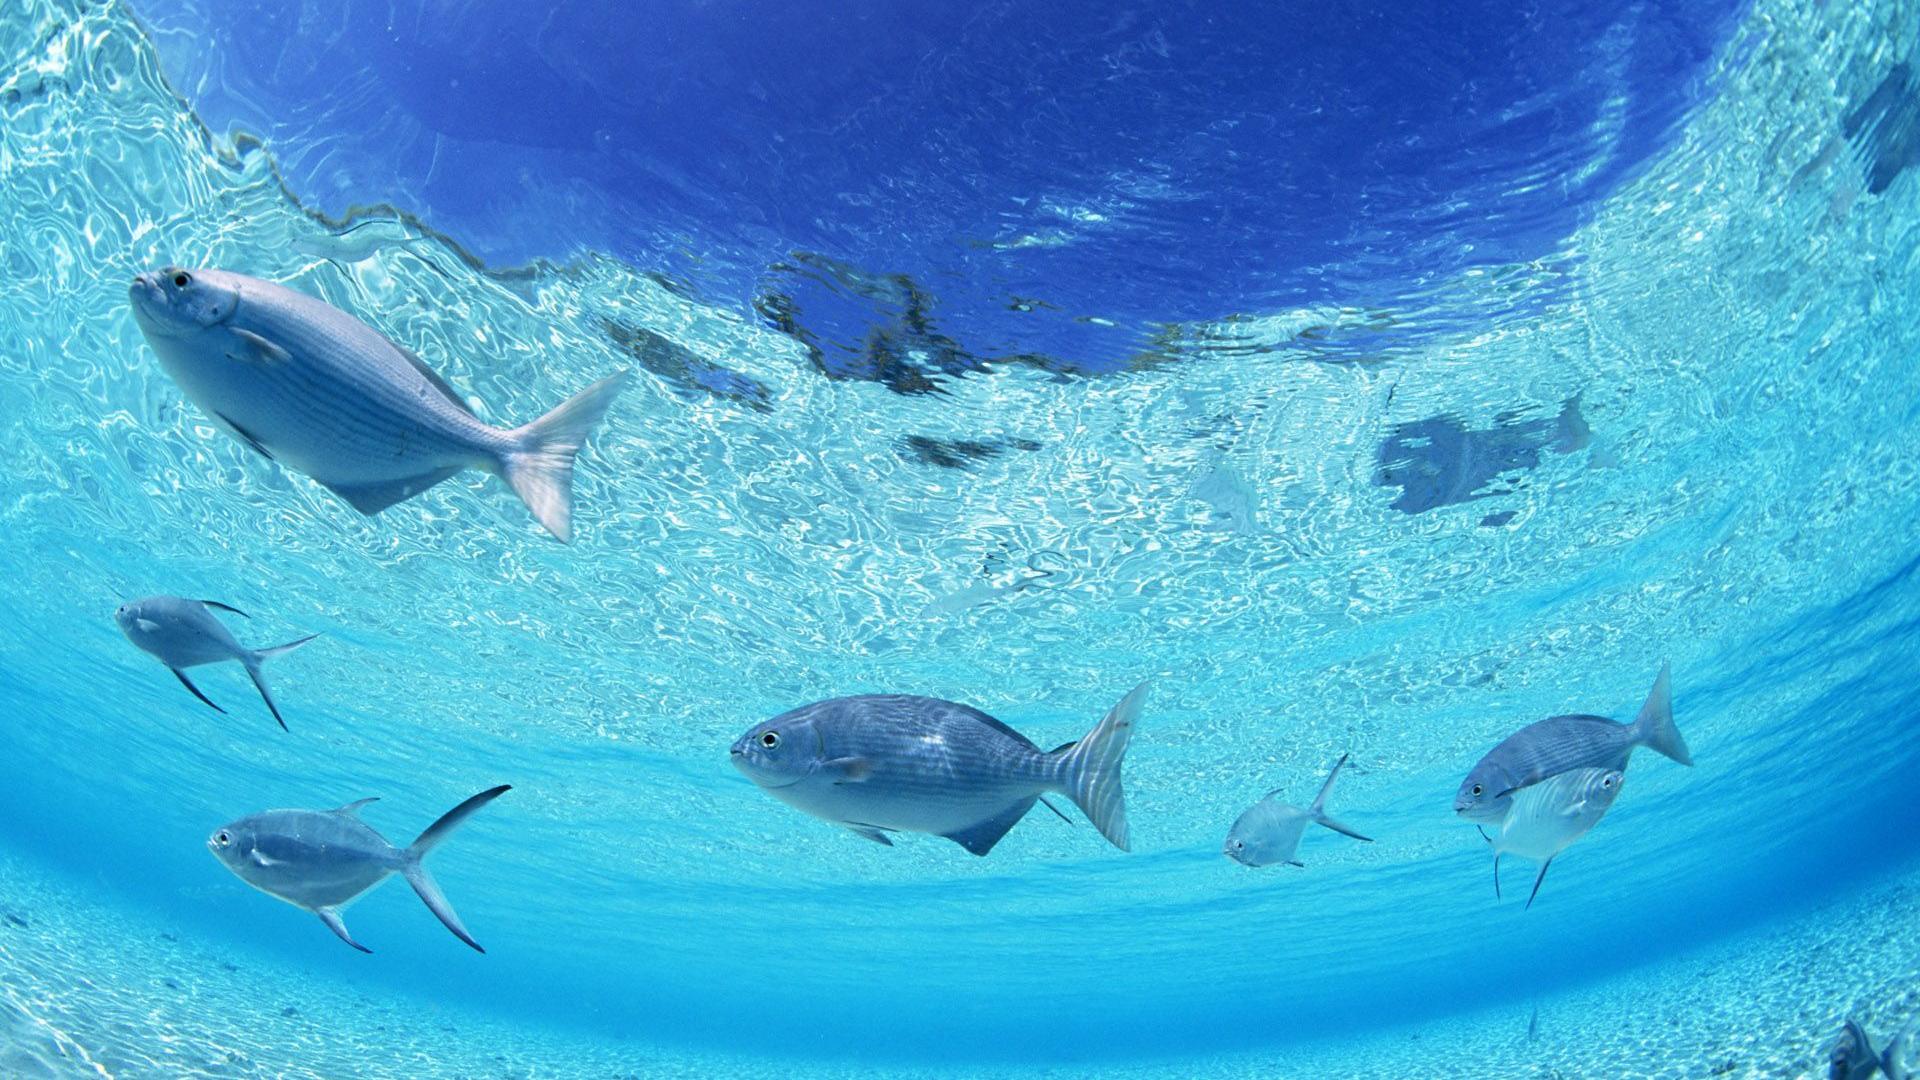 Hd wallpaper underwater - Underwater Wallpaper Hd Wallpaper Wallpapers55 Com Best Wallpapers